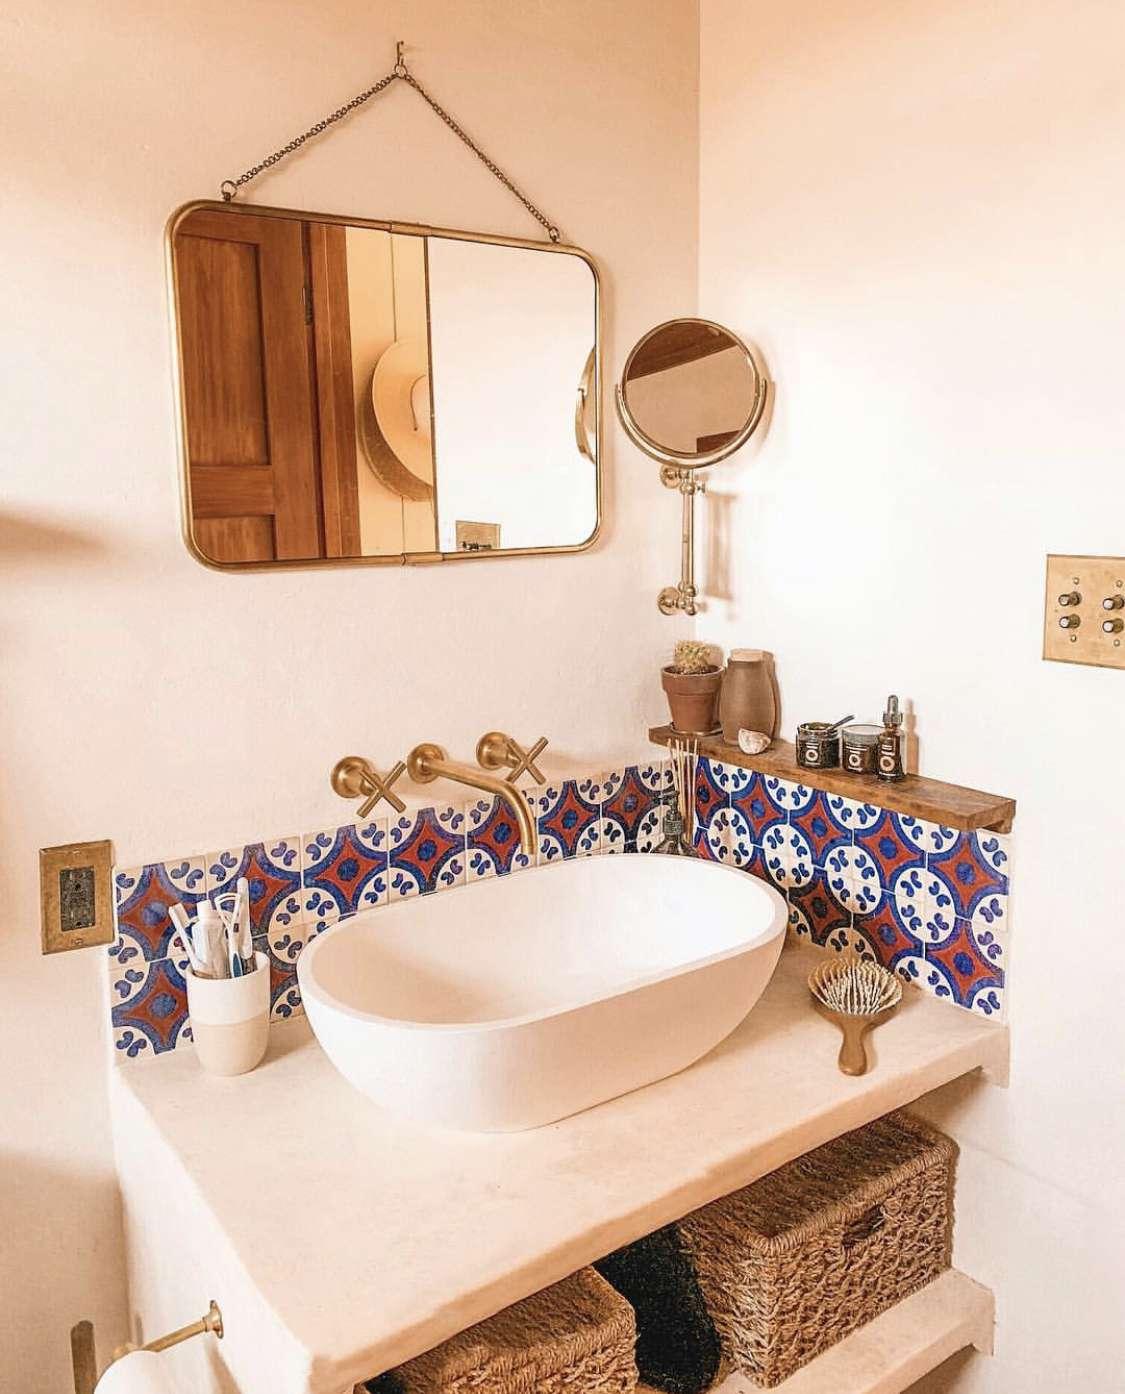 Bathroom at The Joshua Tree House